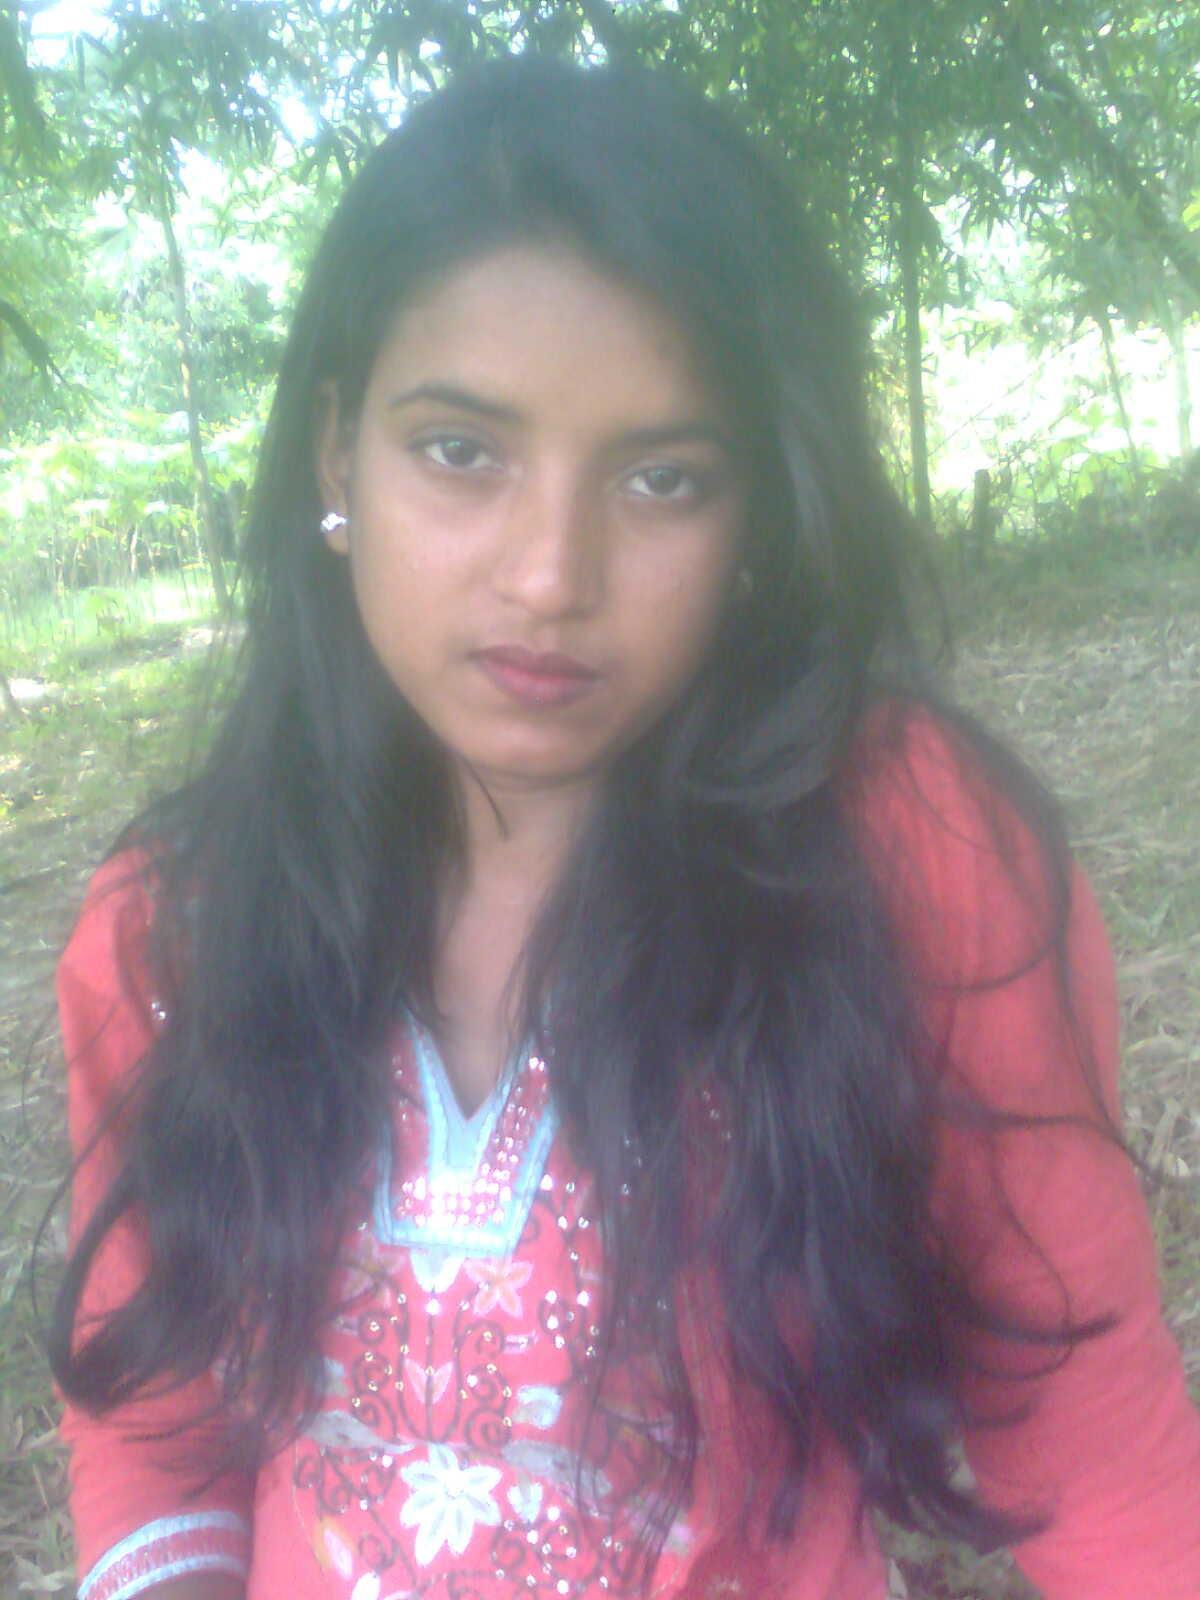 Hot Girls Around The World Desi Cute Teen Girl Pics In -7080